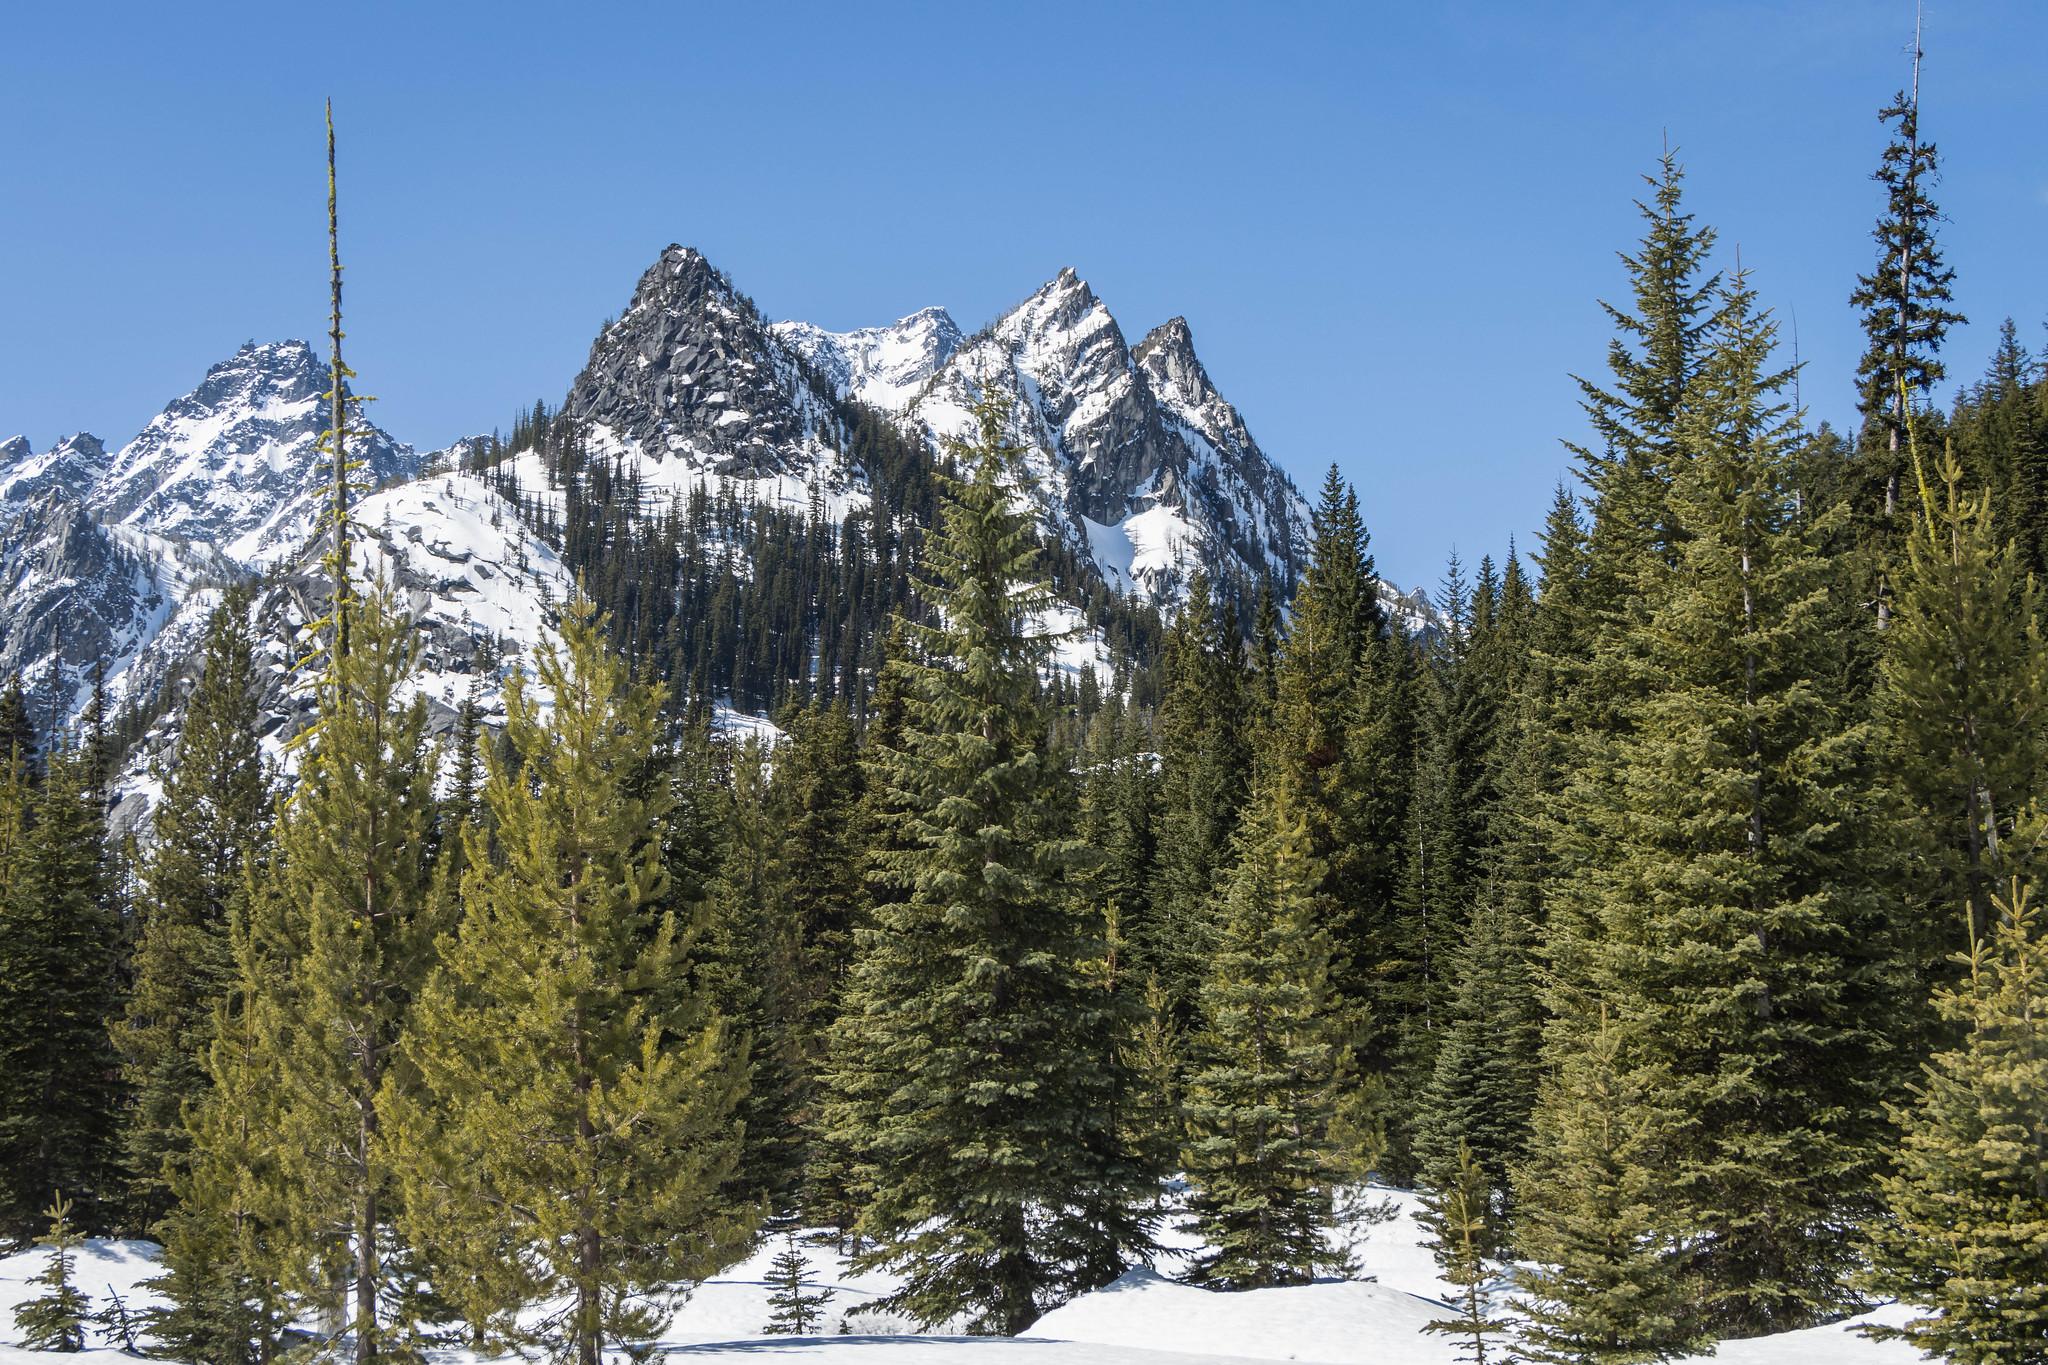 One final look at Mountaineer Ridge